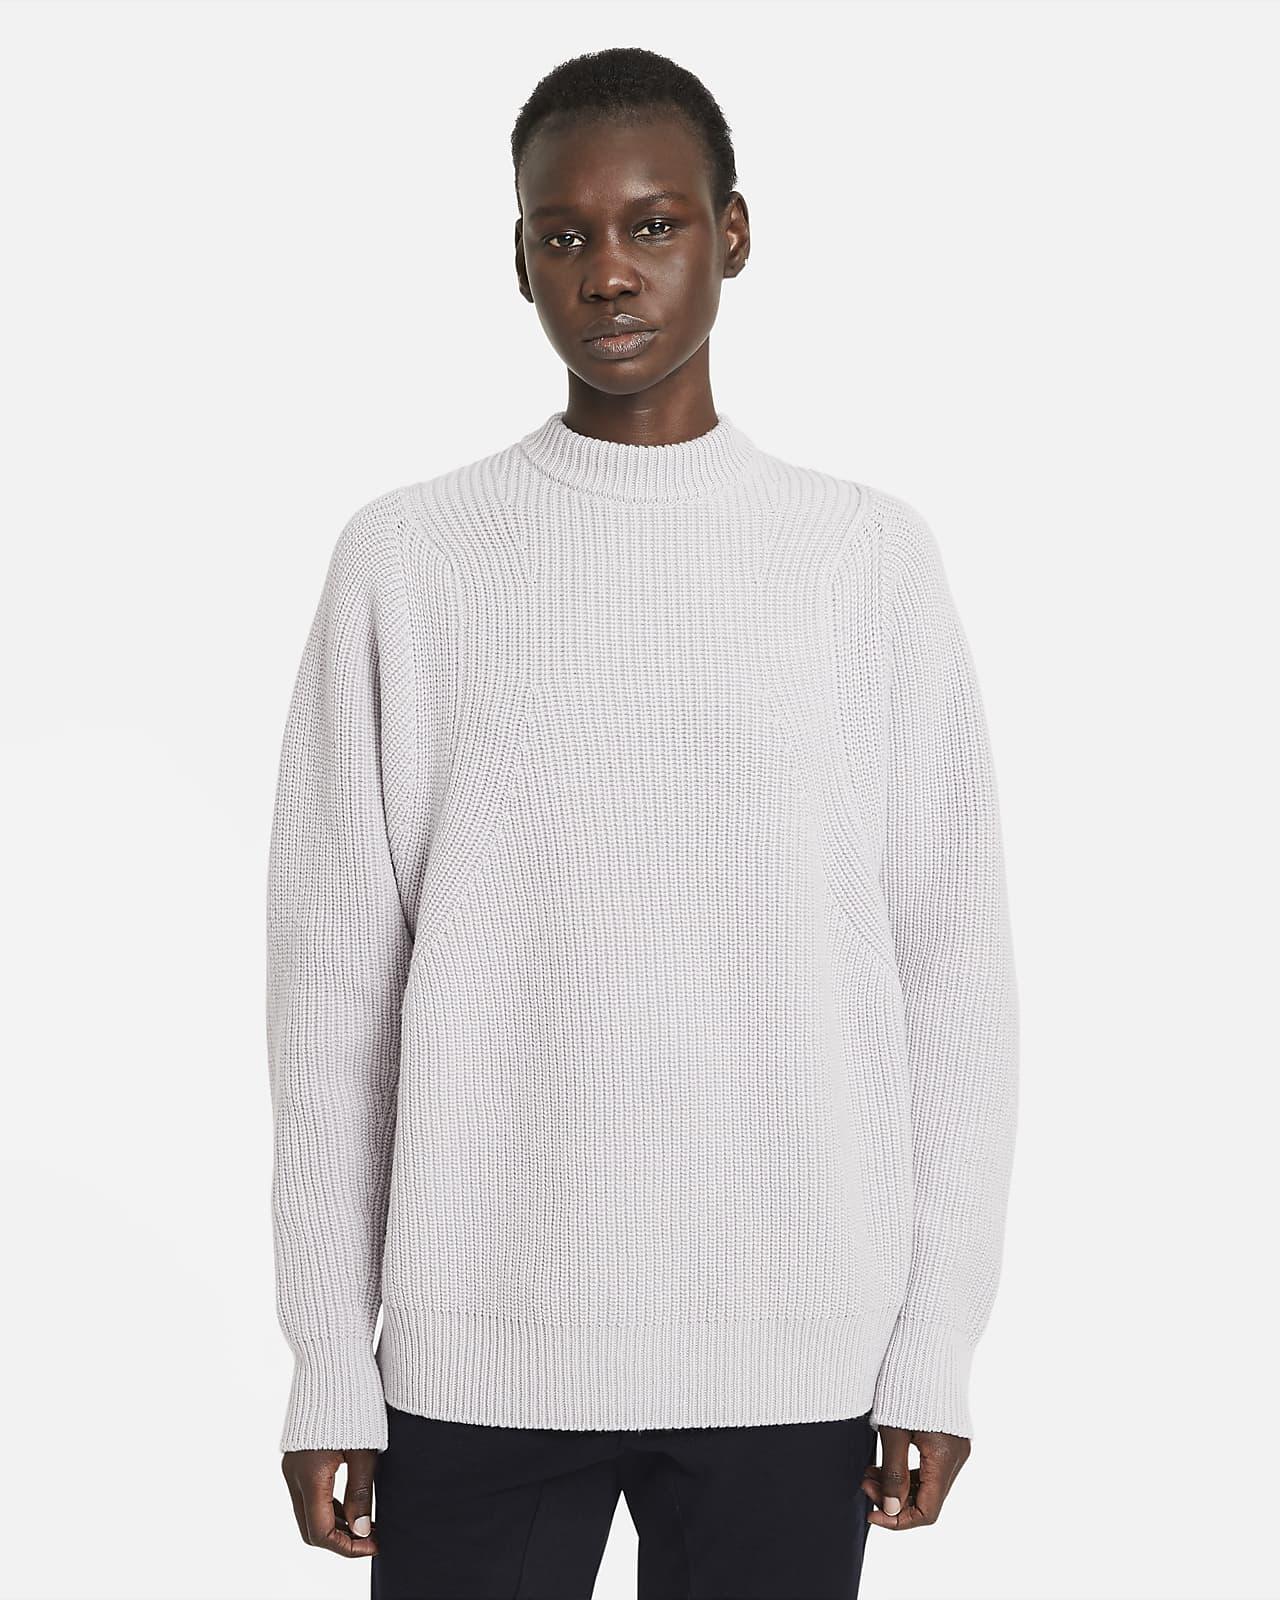 Nike ESC Women's Sweater